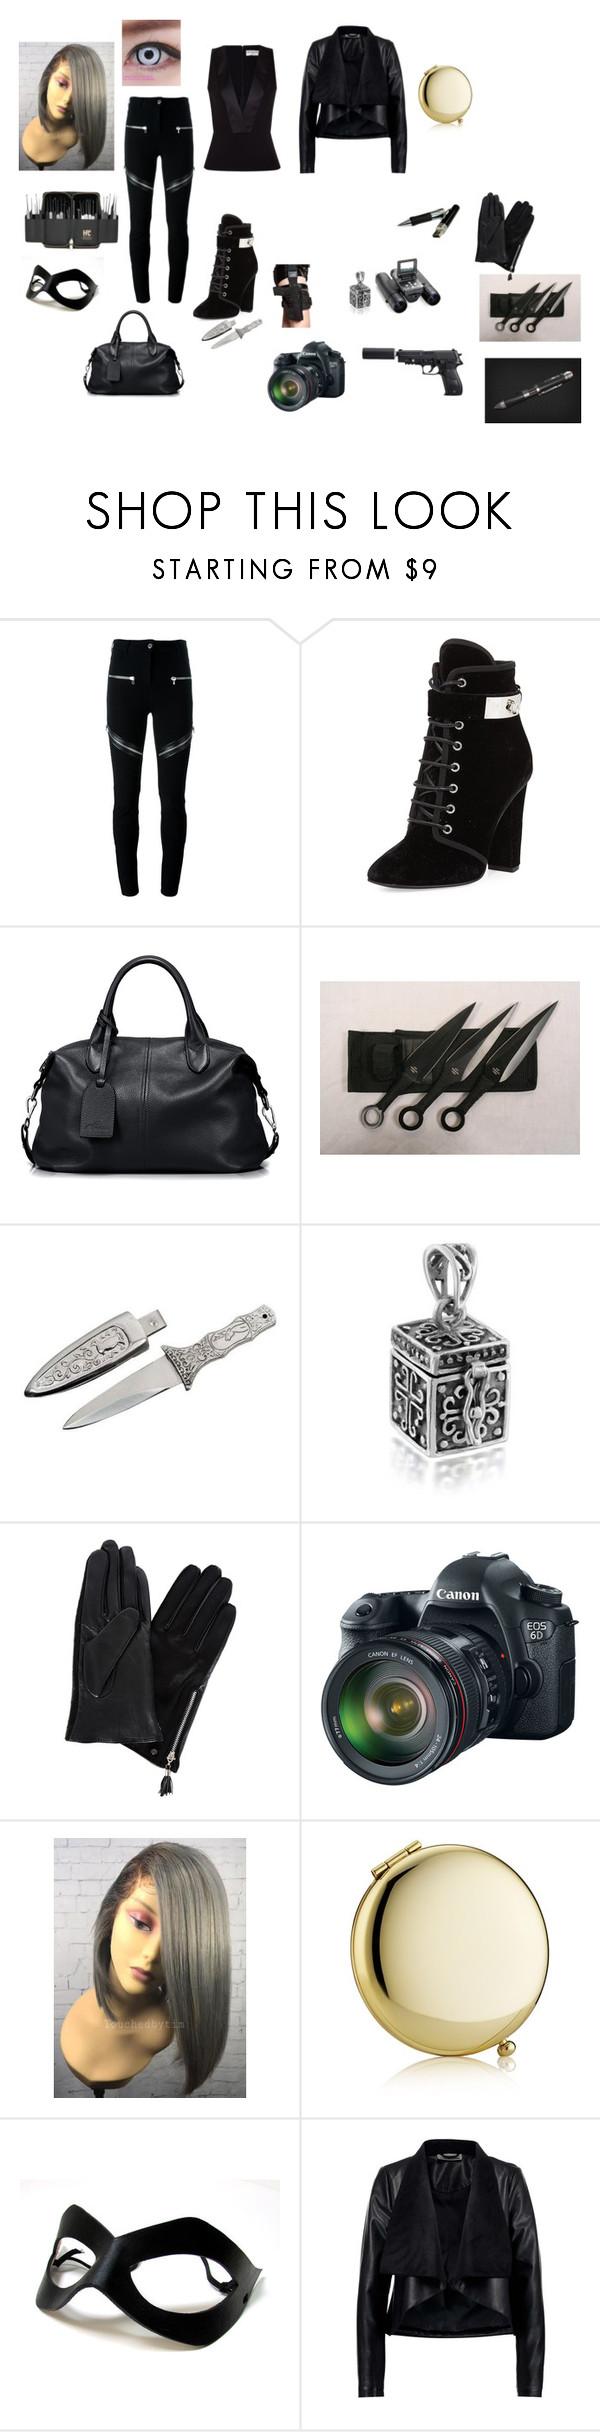 """Untitled #56"" by randomfashionsxoxo ❤ liked on Polyvore featuring Givenchy, Giuseppe Zanotti, Bushnell, Spy Optic, Bling Jewelry, Dents, Eos, Estée Lauder and Balenciaga"